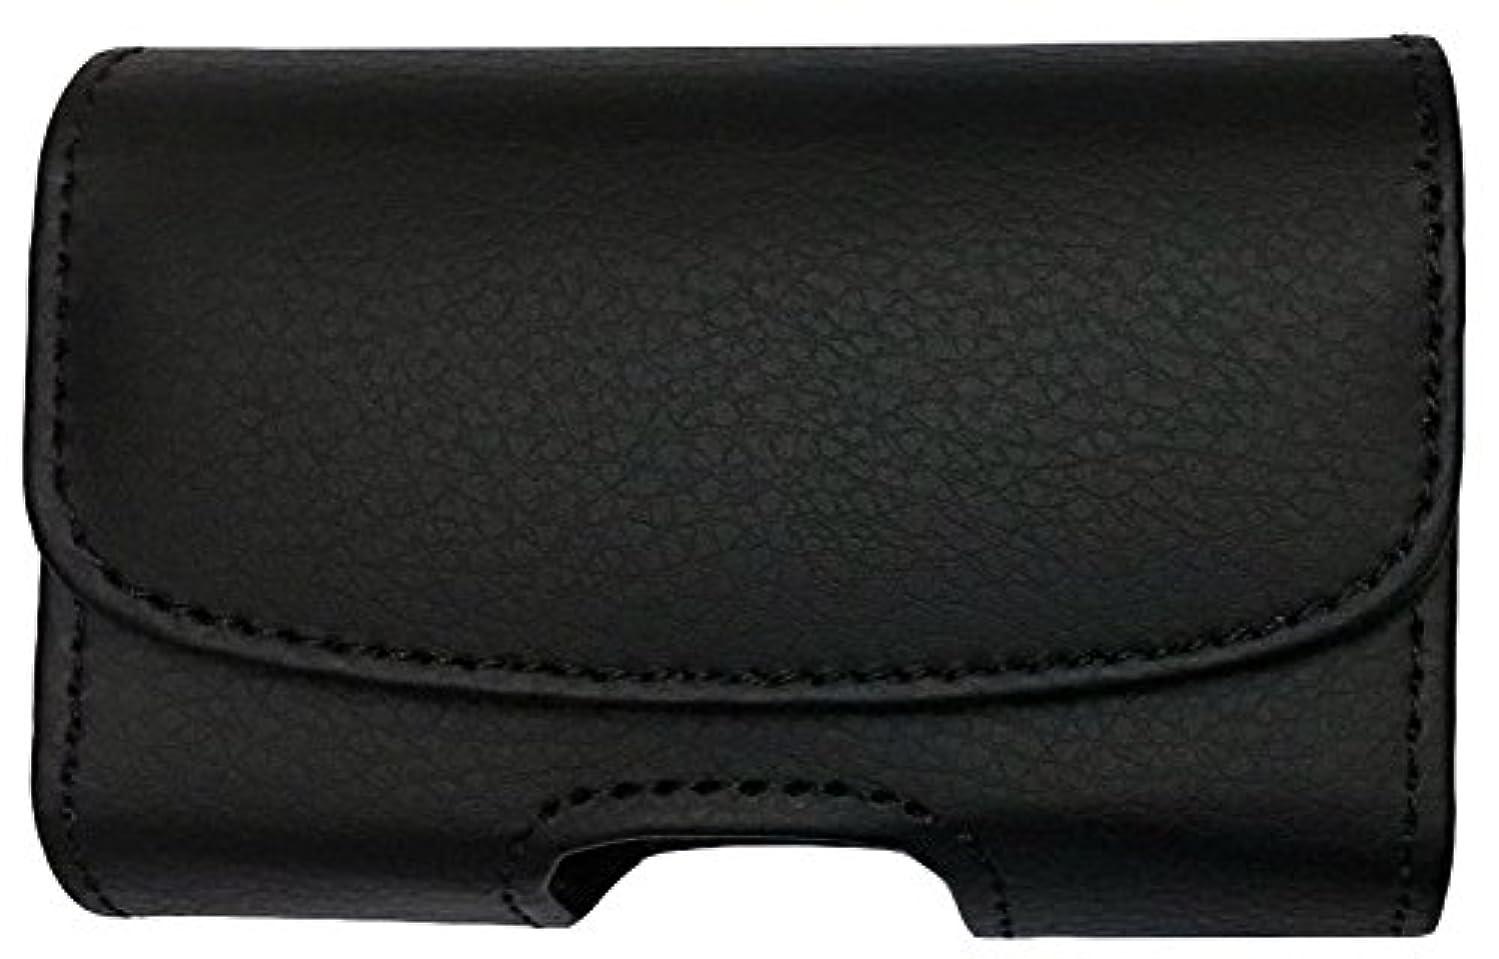 Classic Premium Pouch Case with Belt Clip for Dexcom G6 CGM System (Dexcom G6 Continuous Glucose Monitoring) -SNK Retail Packaging (H1-Black/VE)